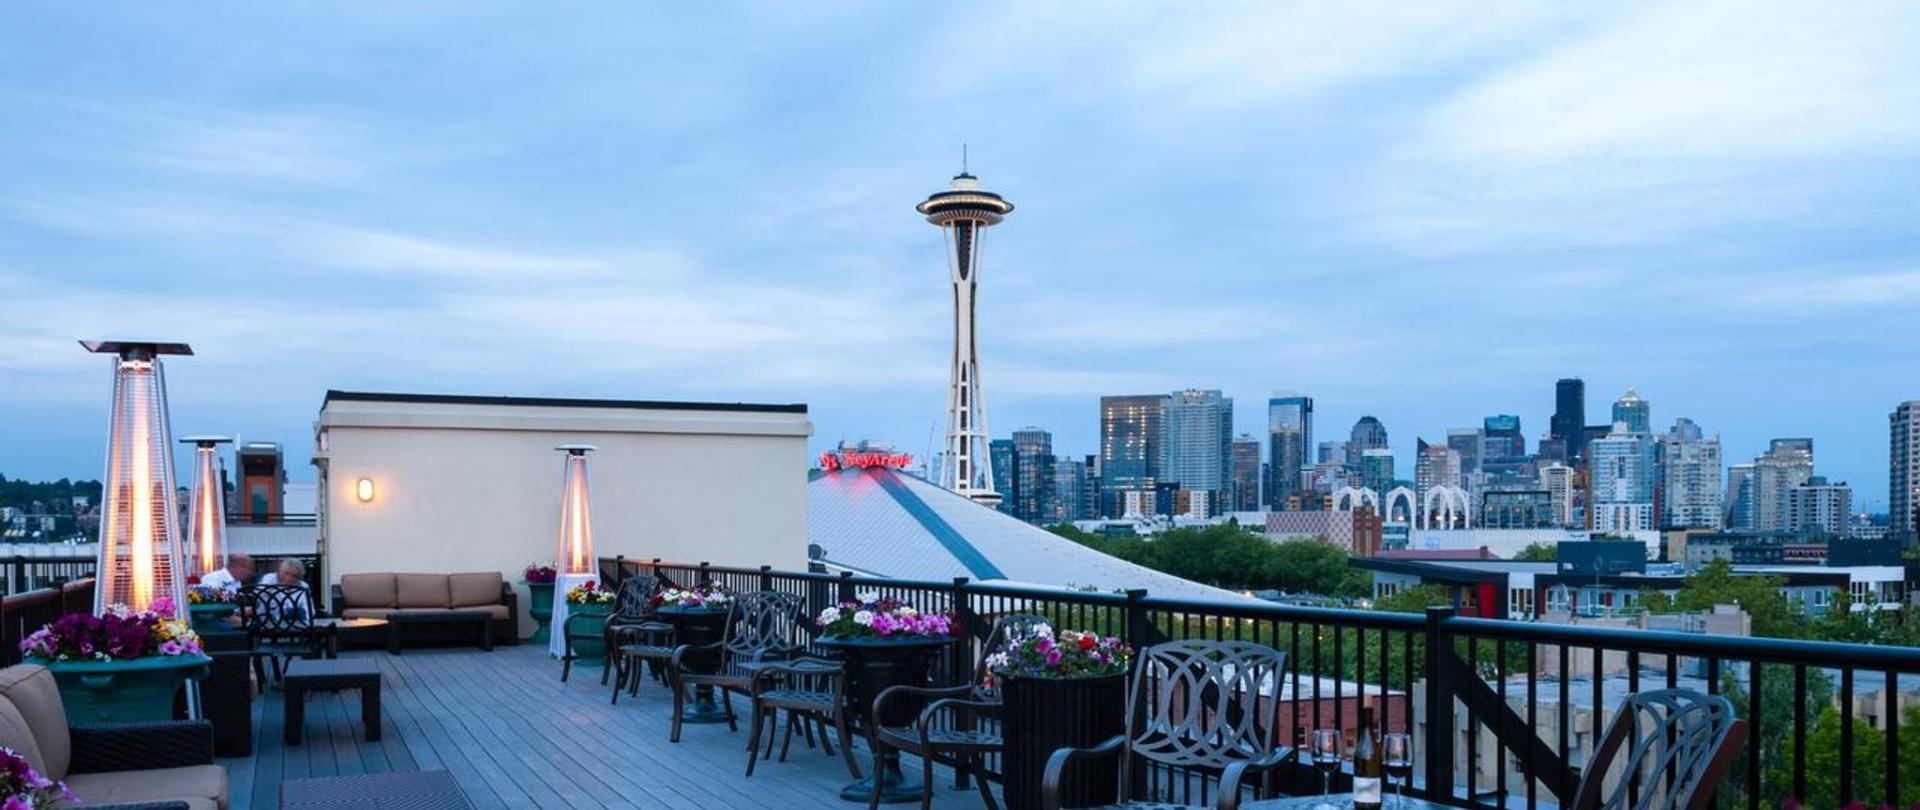 Best of Seattle - Queens Anne.jpg